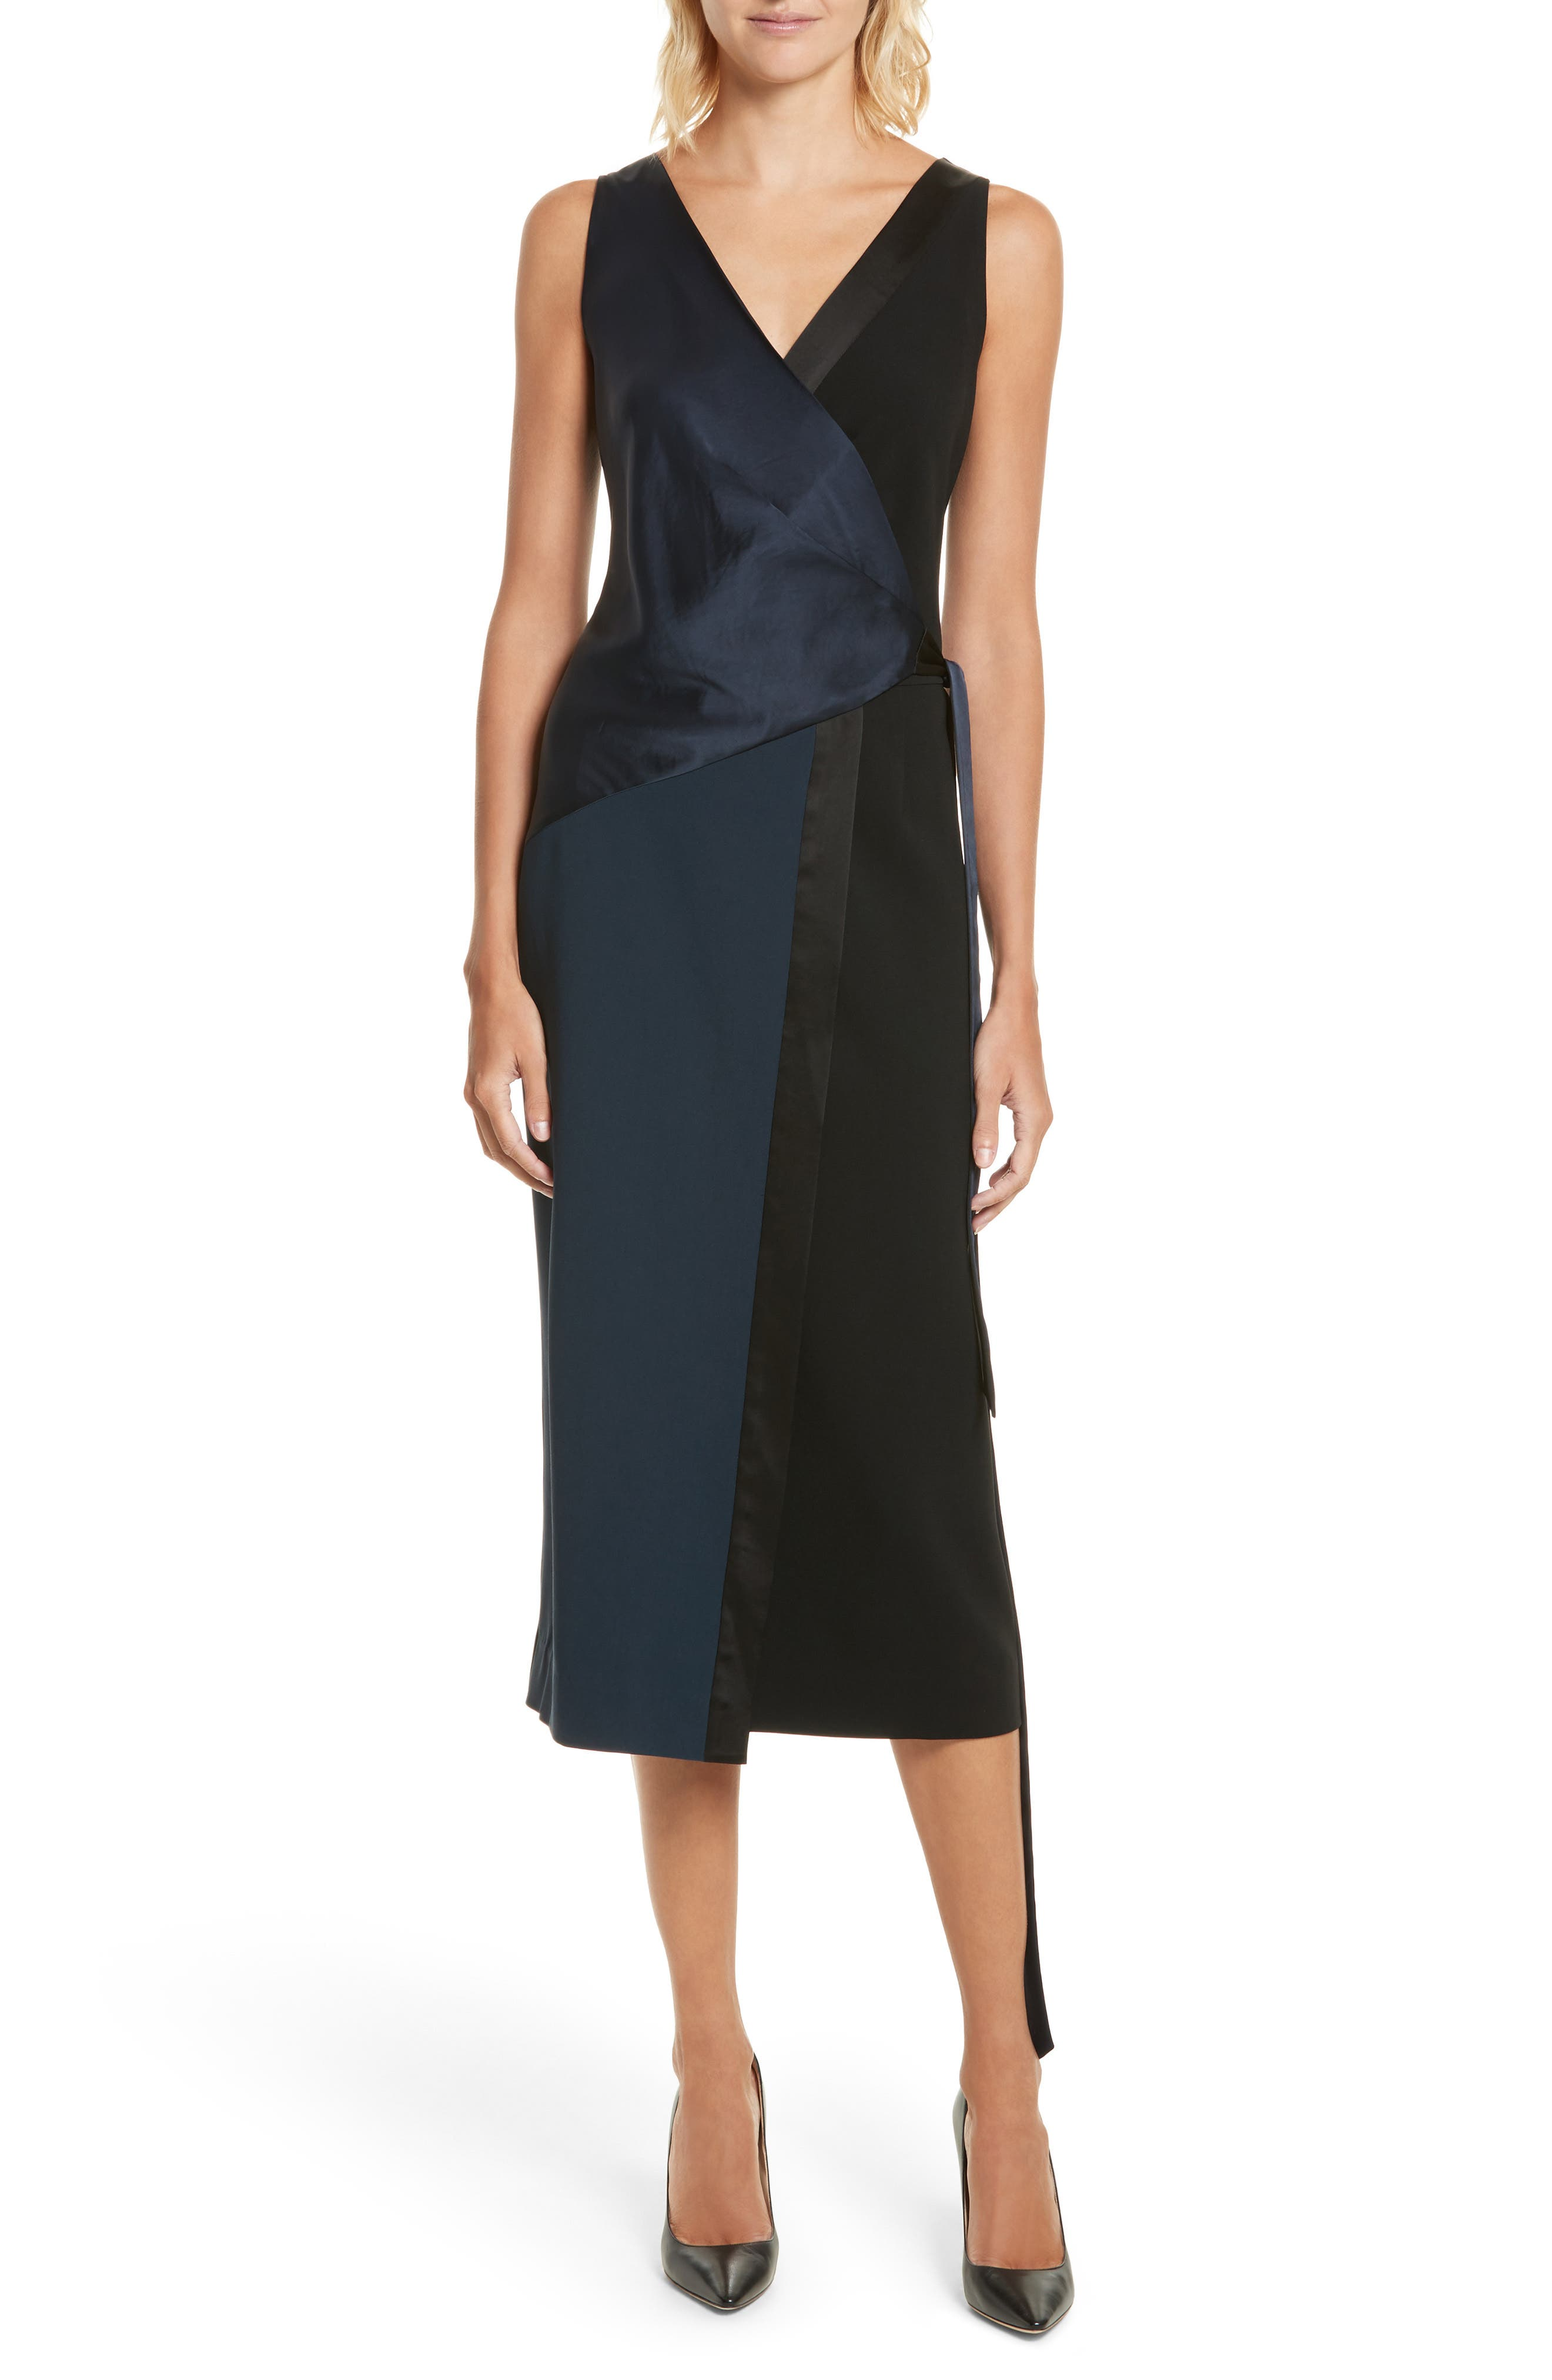 Alternate Image 1 Selected - Diane von Furstenberg Midi Wrap Dress